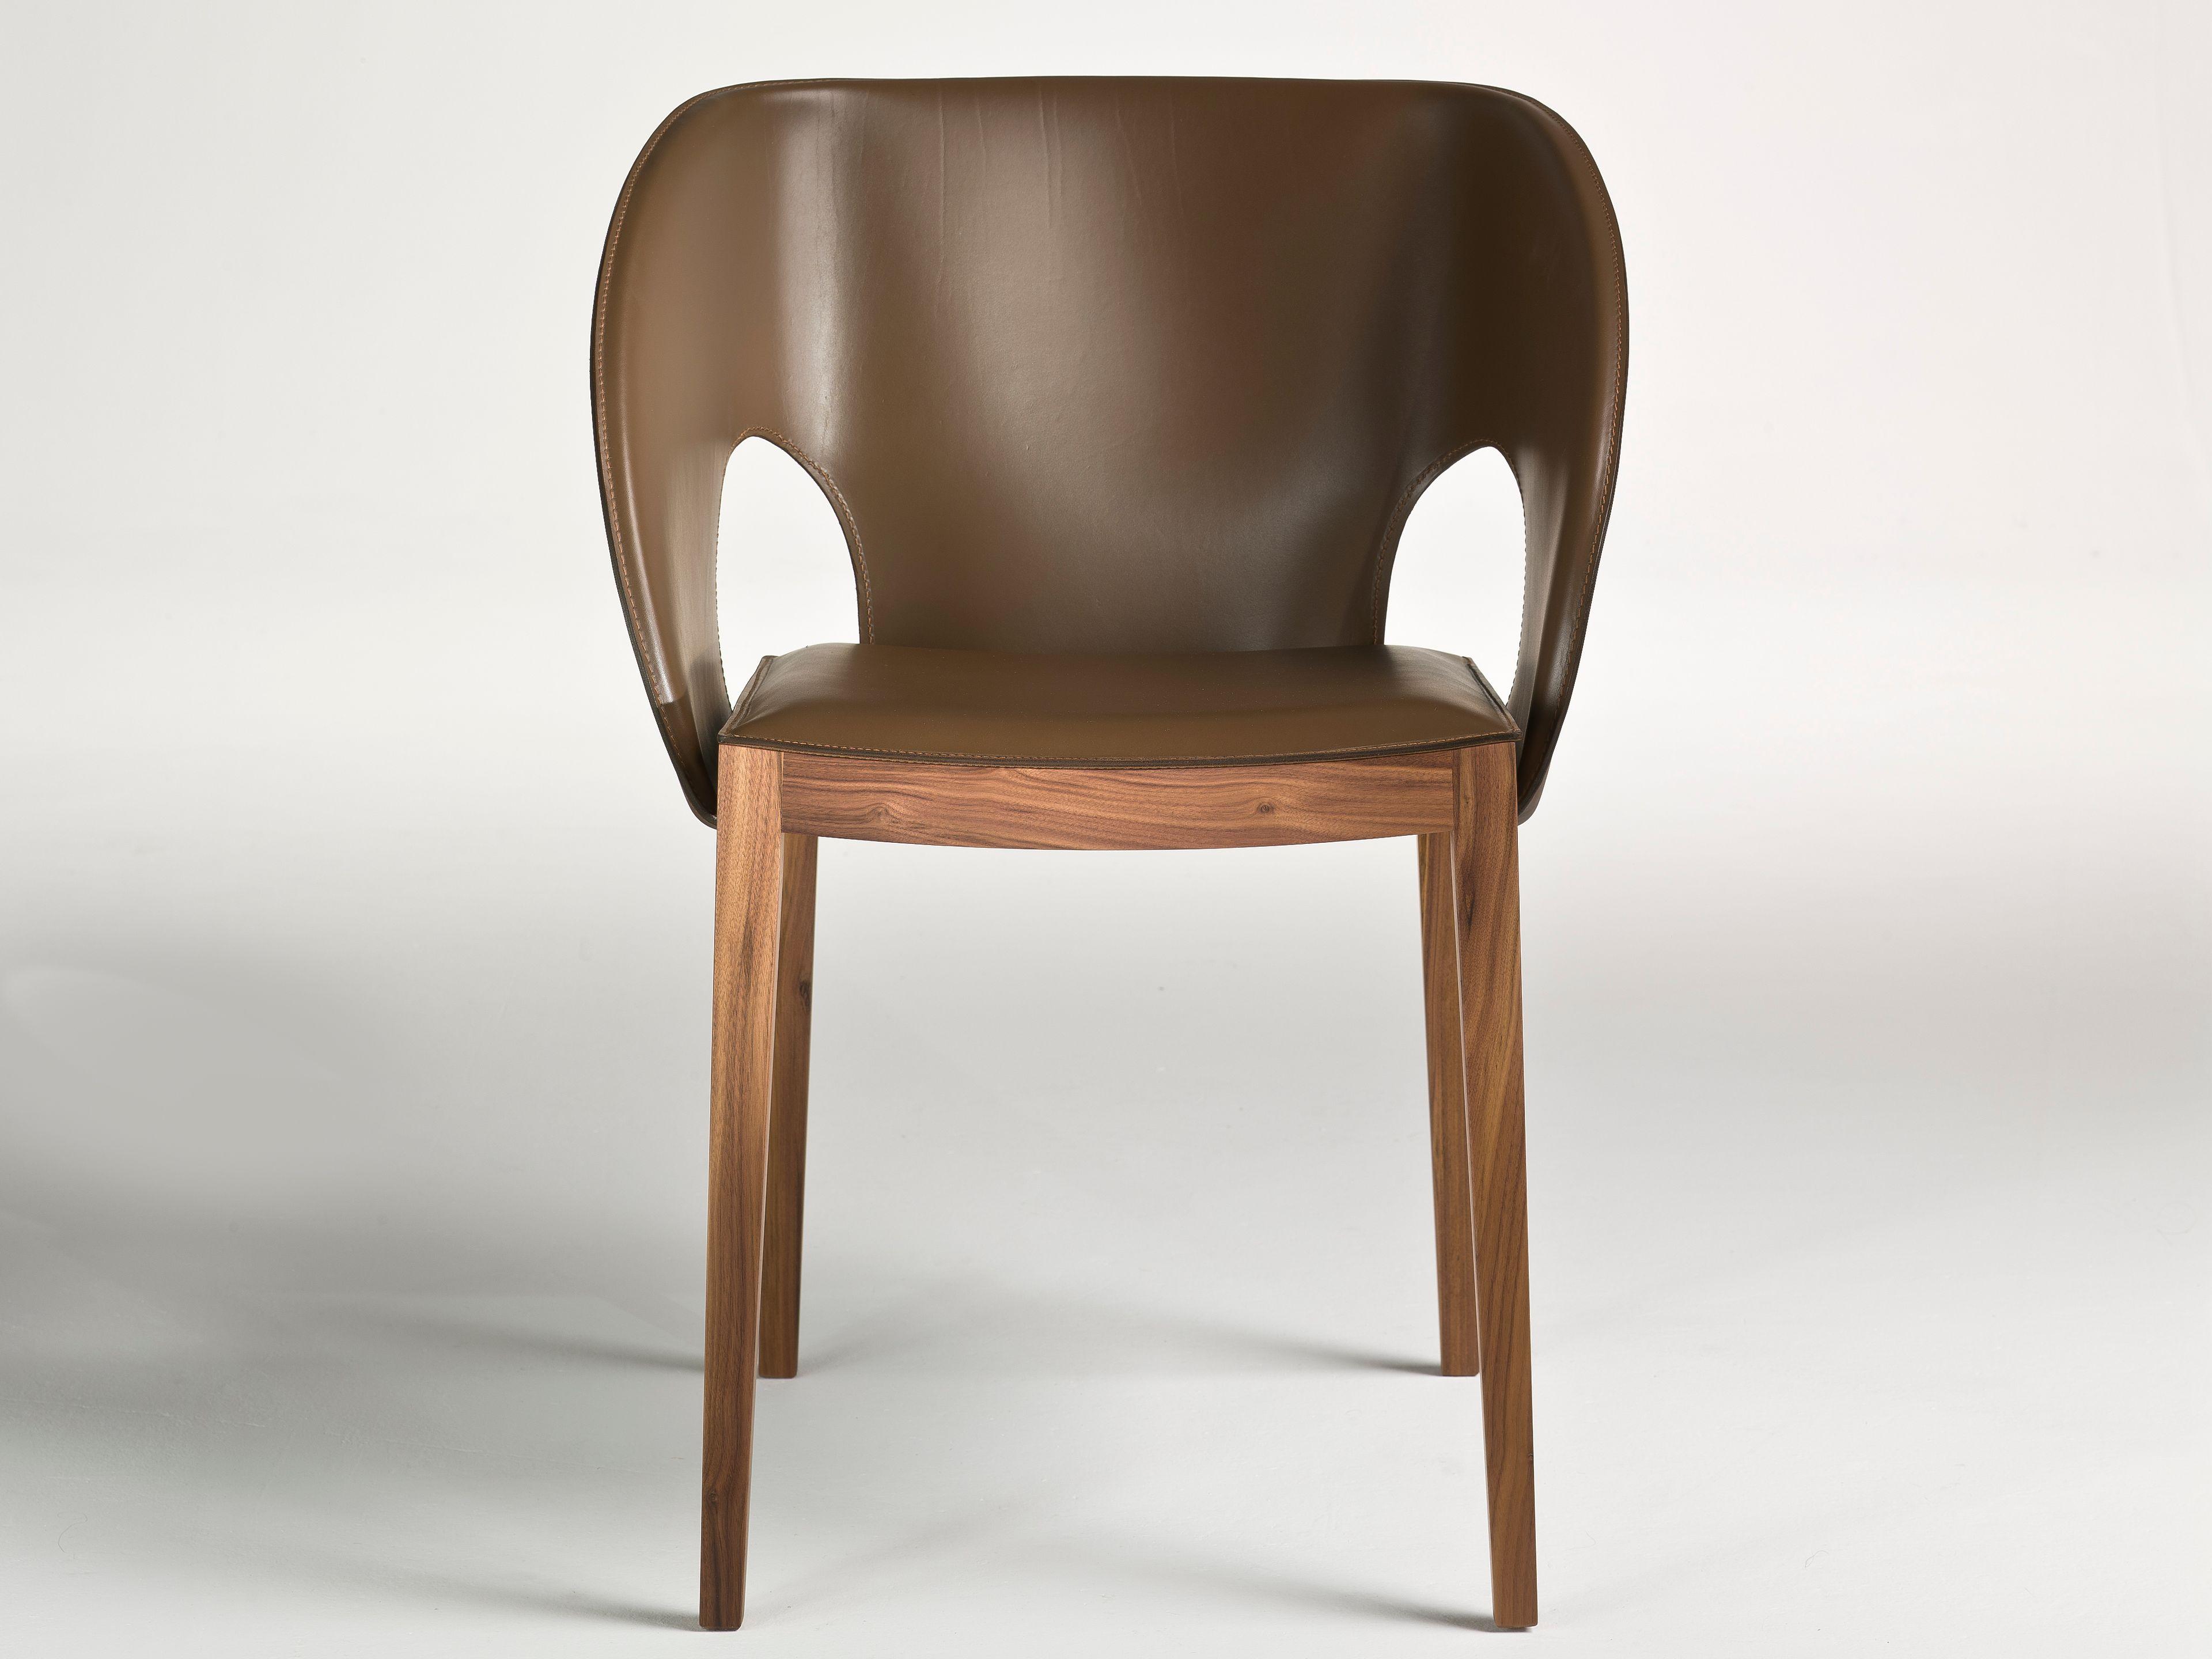 Voile silla de madera by i 4 mariani dise o alessandro dubini for Catalogo de sillas de madera